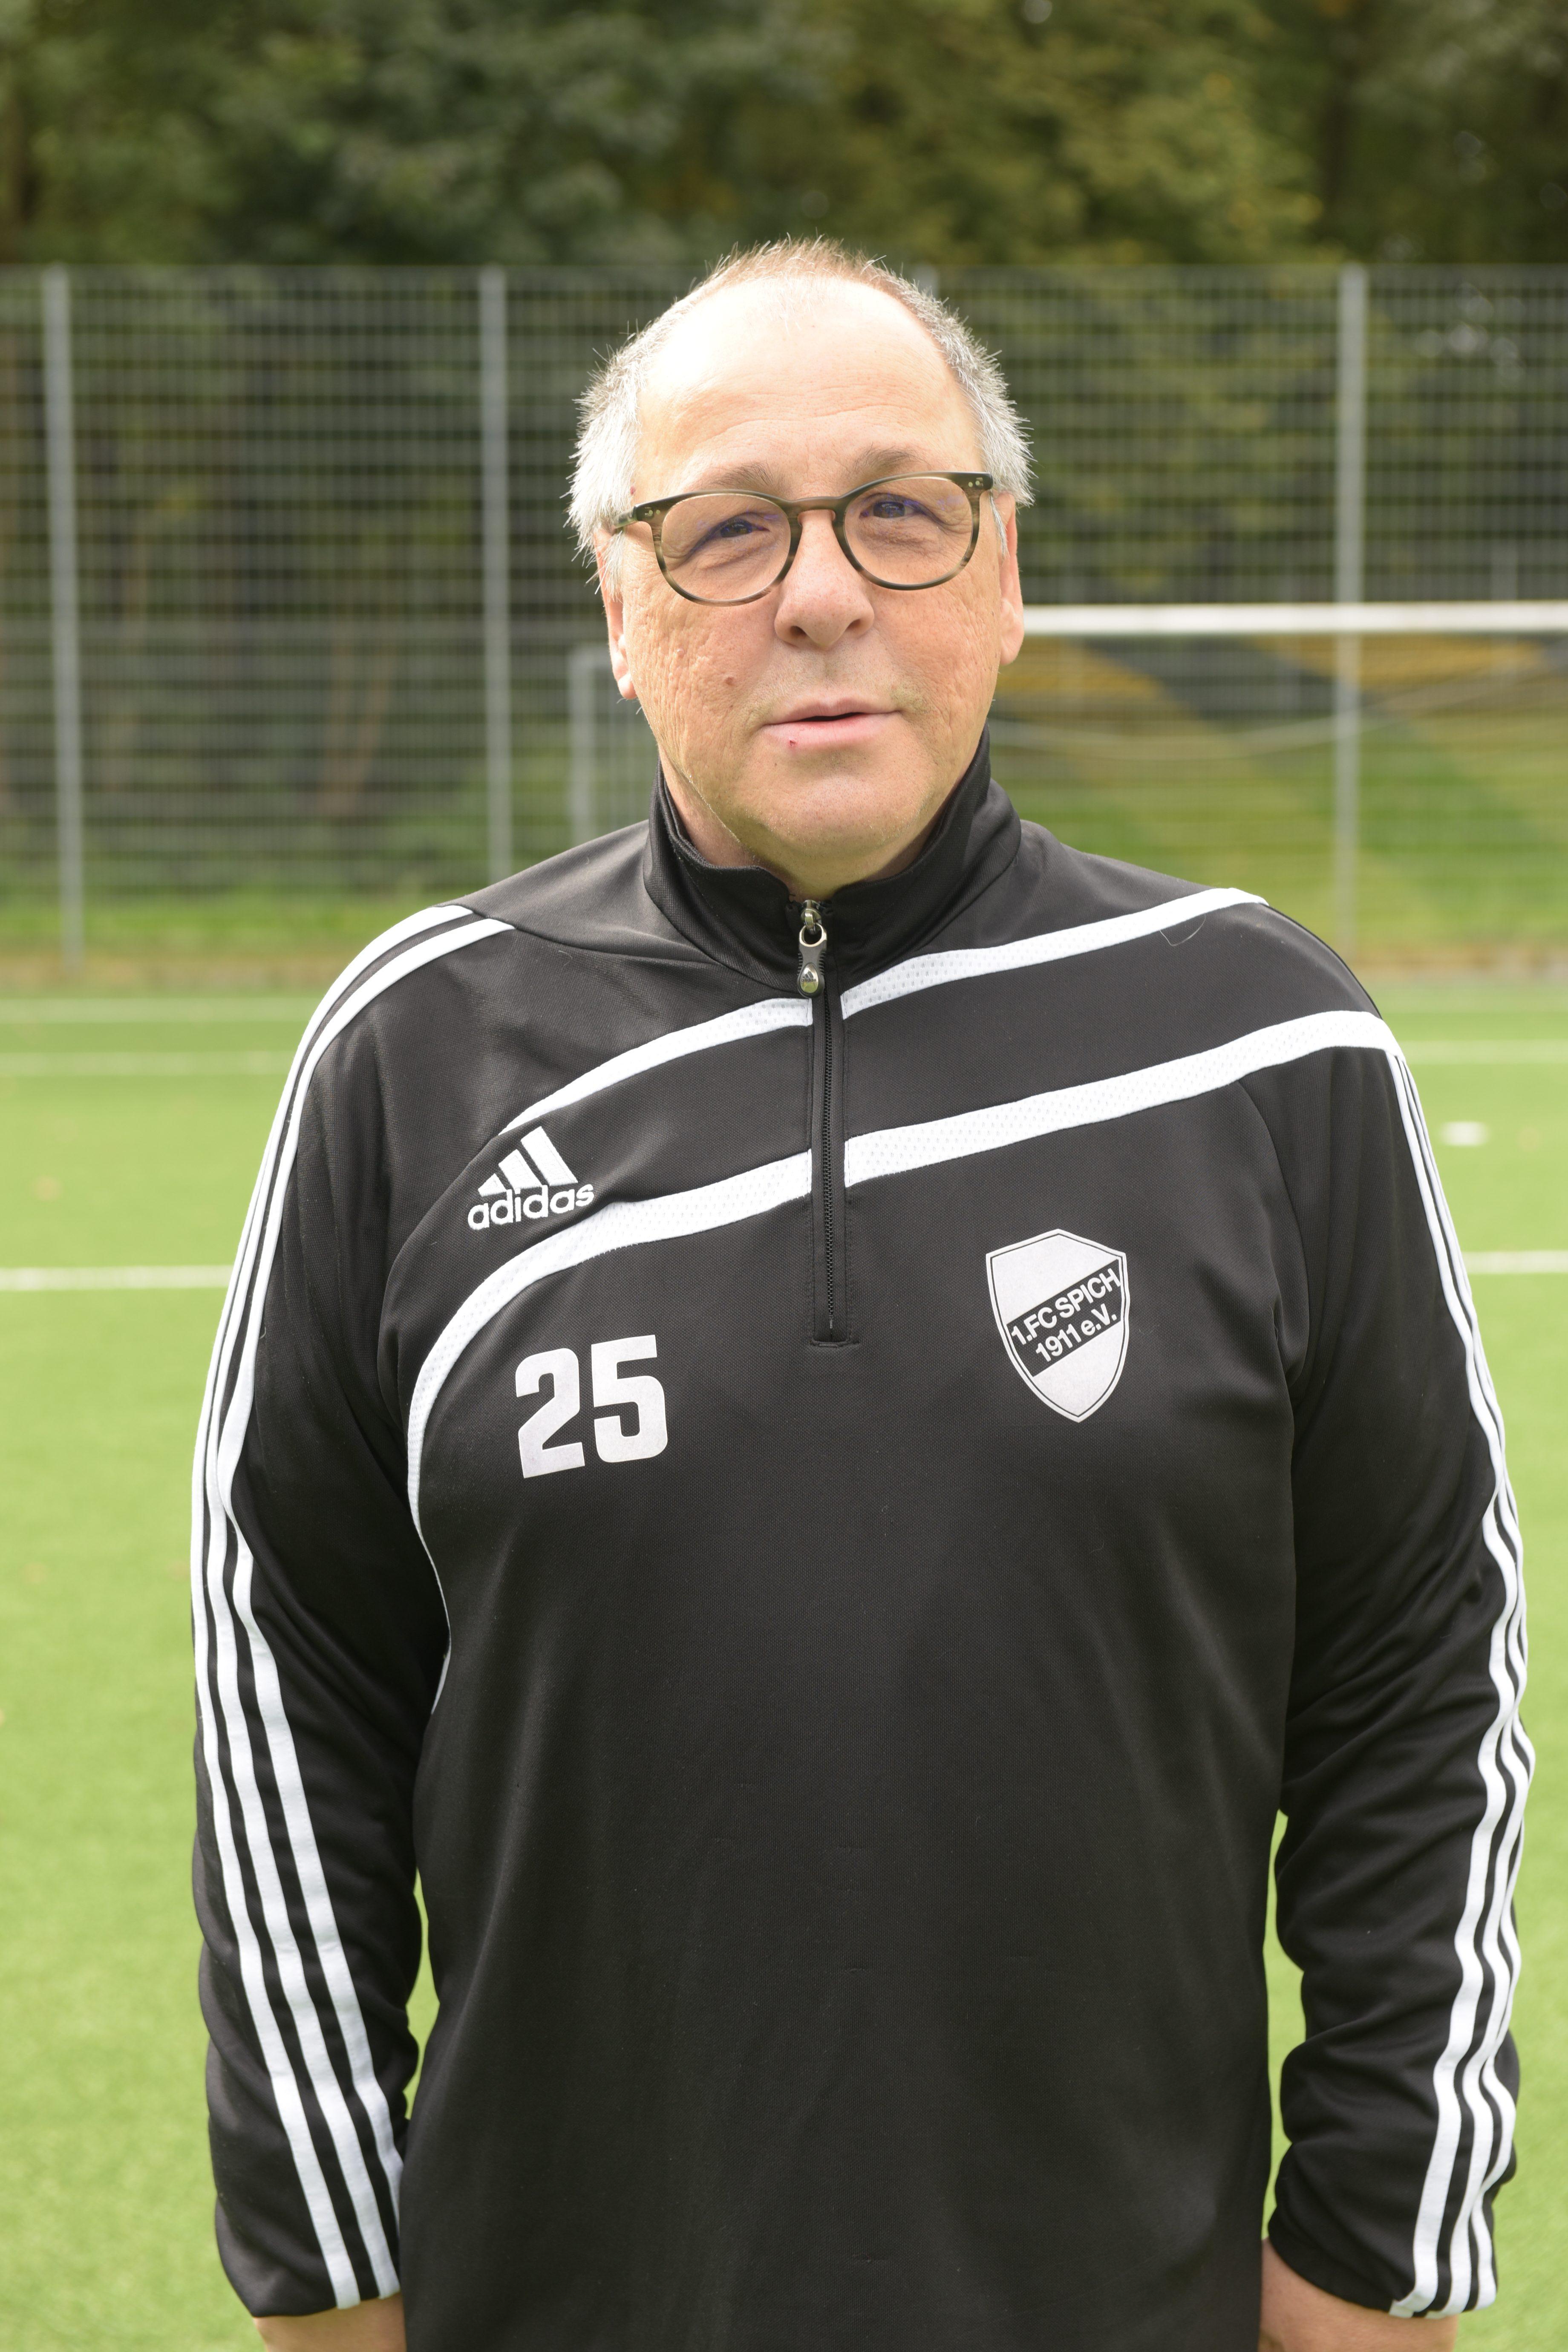 Olaf Schiemann